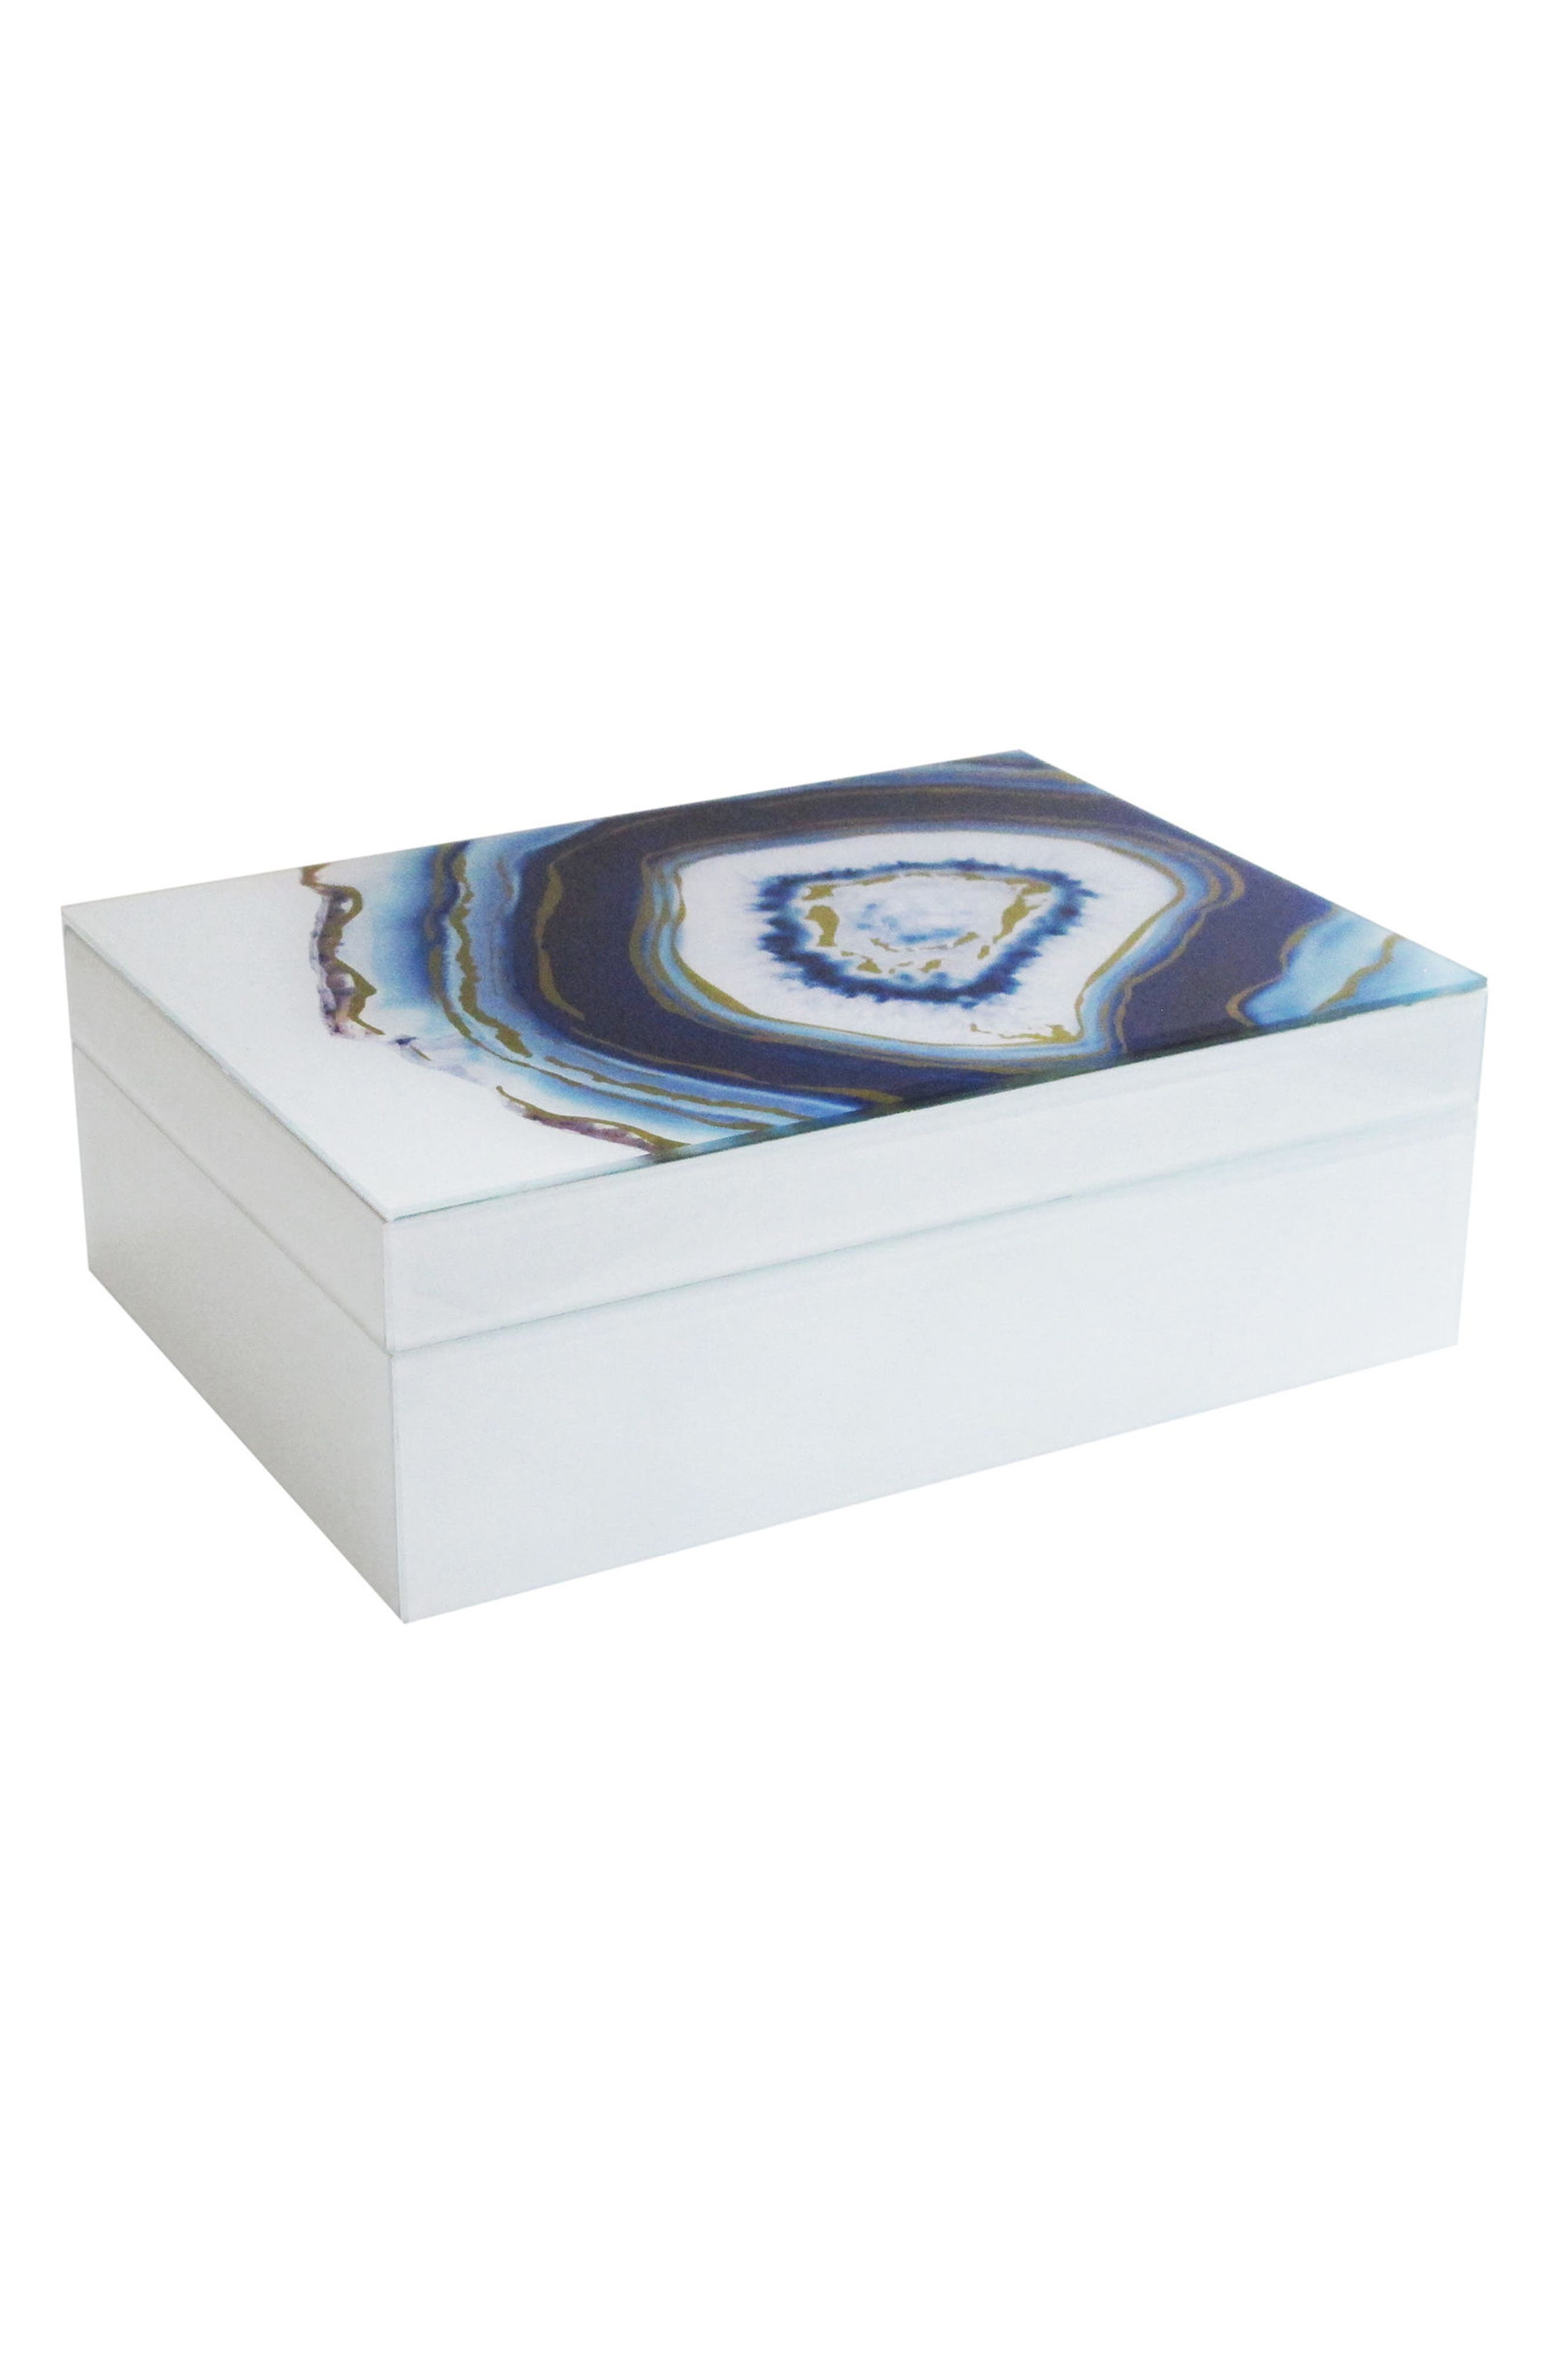 Agate Swirl Jewelry Box,                             Main thumbnail 1, color,                             400